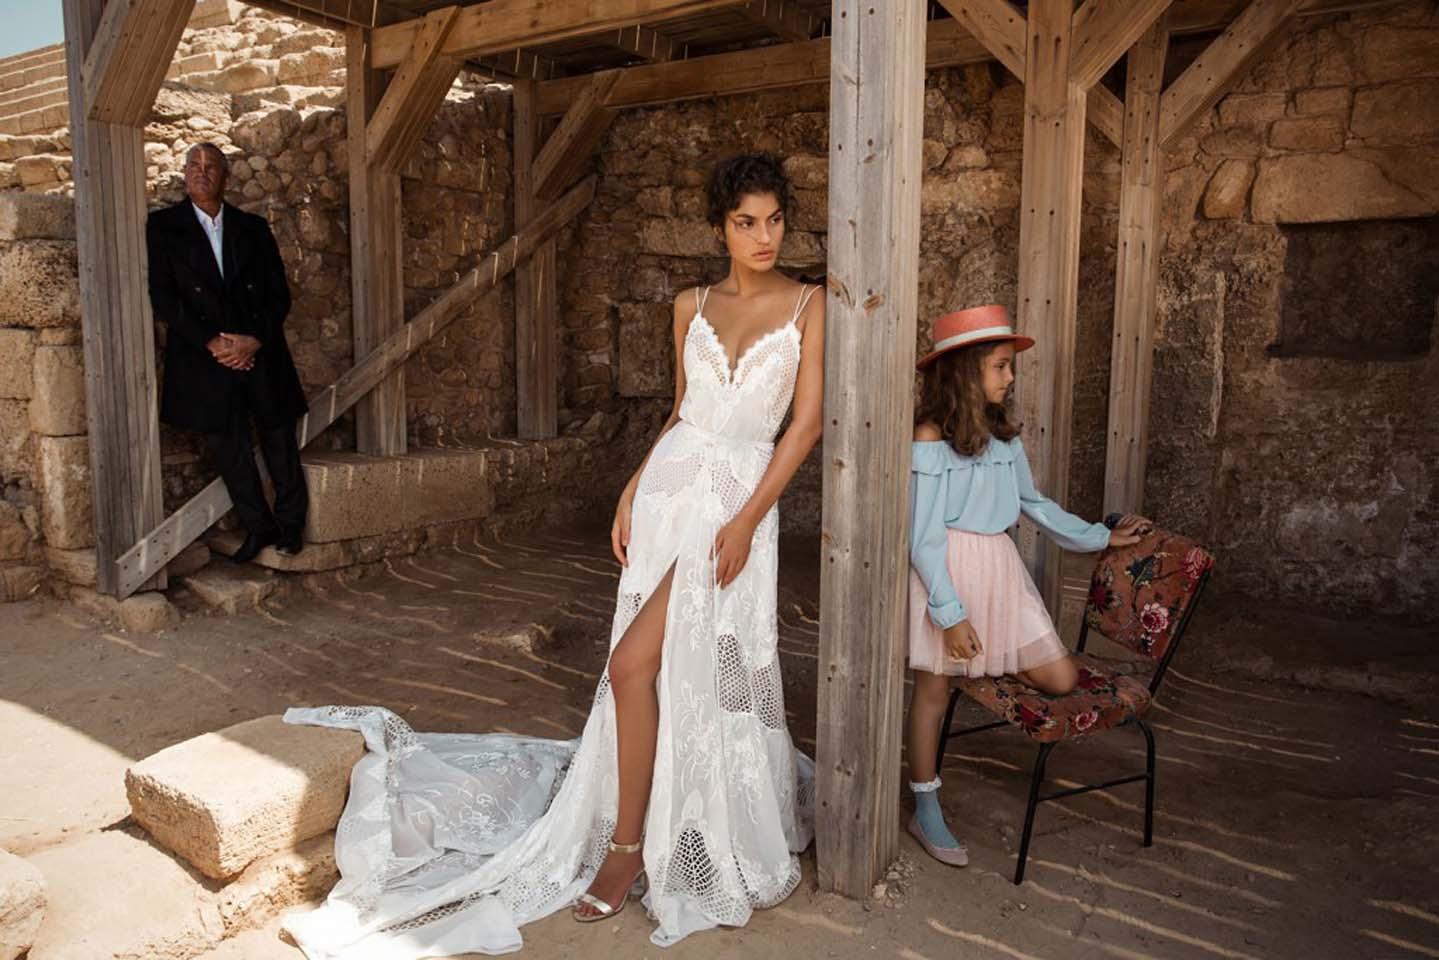 GaliaLahav-bridal-collection-spring-summer-2017-wedding-gowns-designer-beautiful (20)-white-high-slit